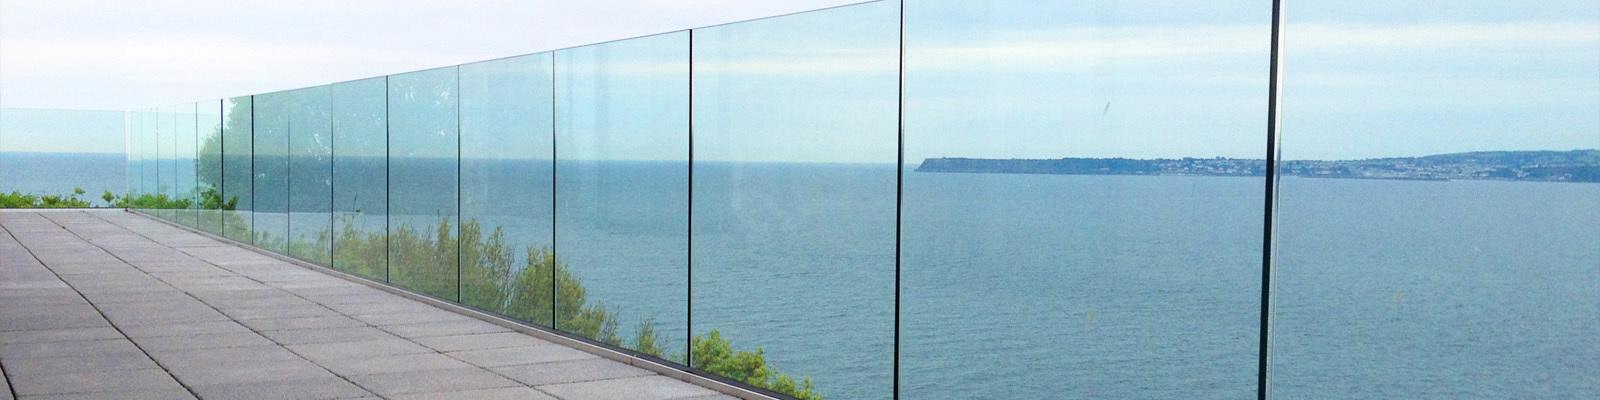 Glass Balustrades Rotorua Windscreens Frameless Shower